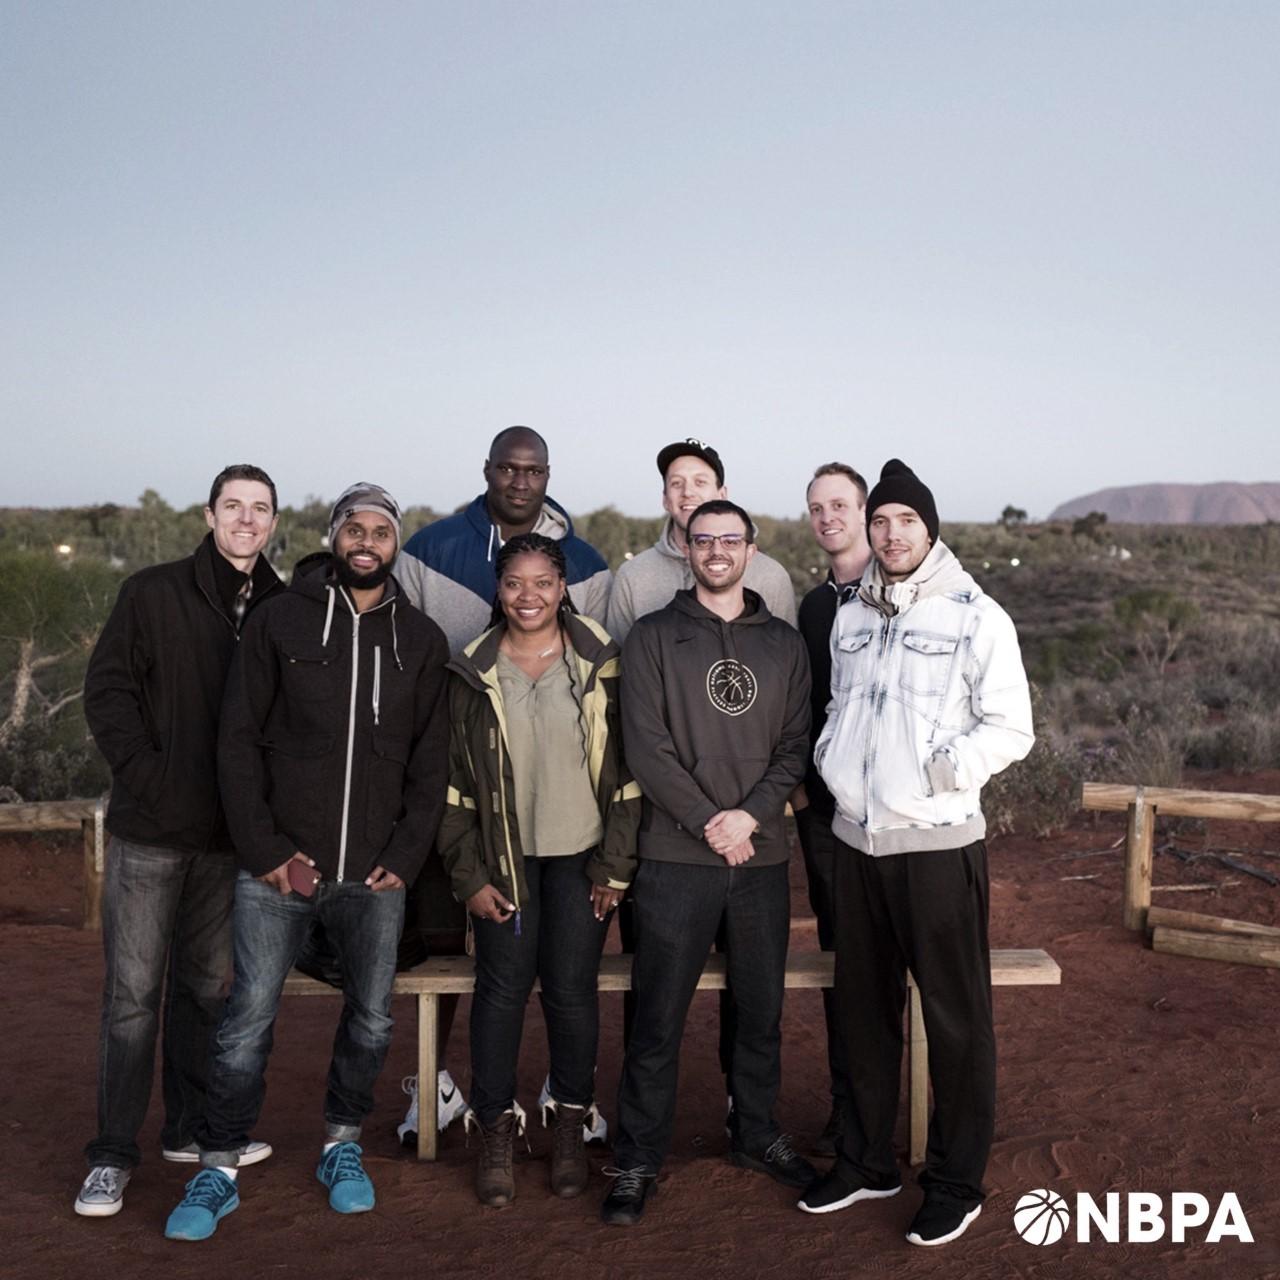 Aussie NBA players donate to bushfire aid